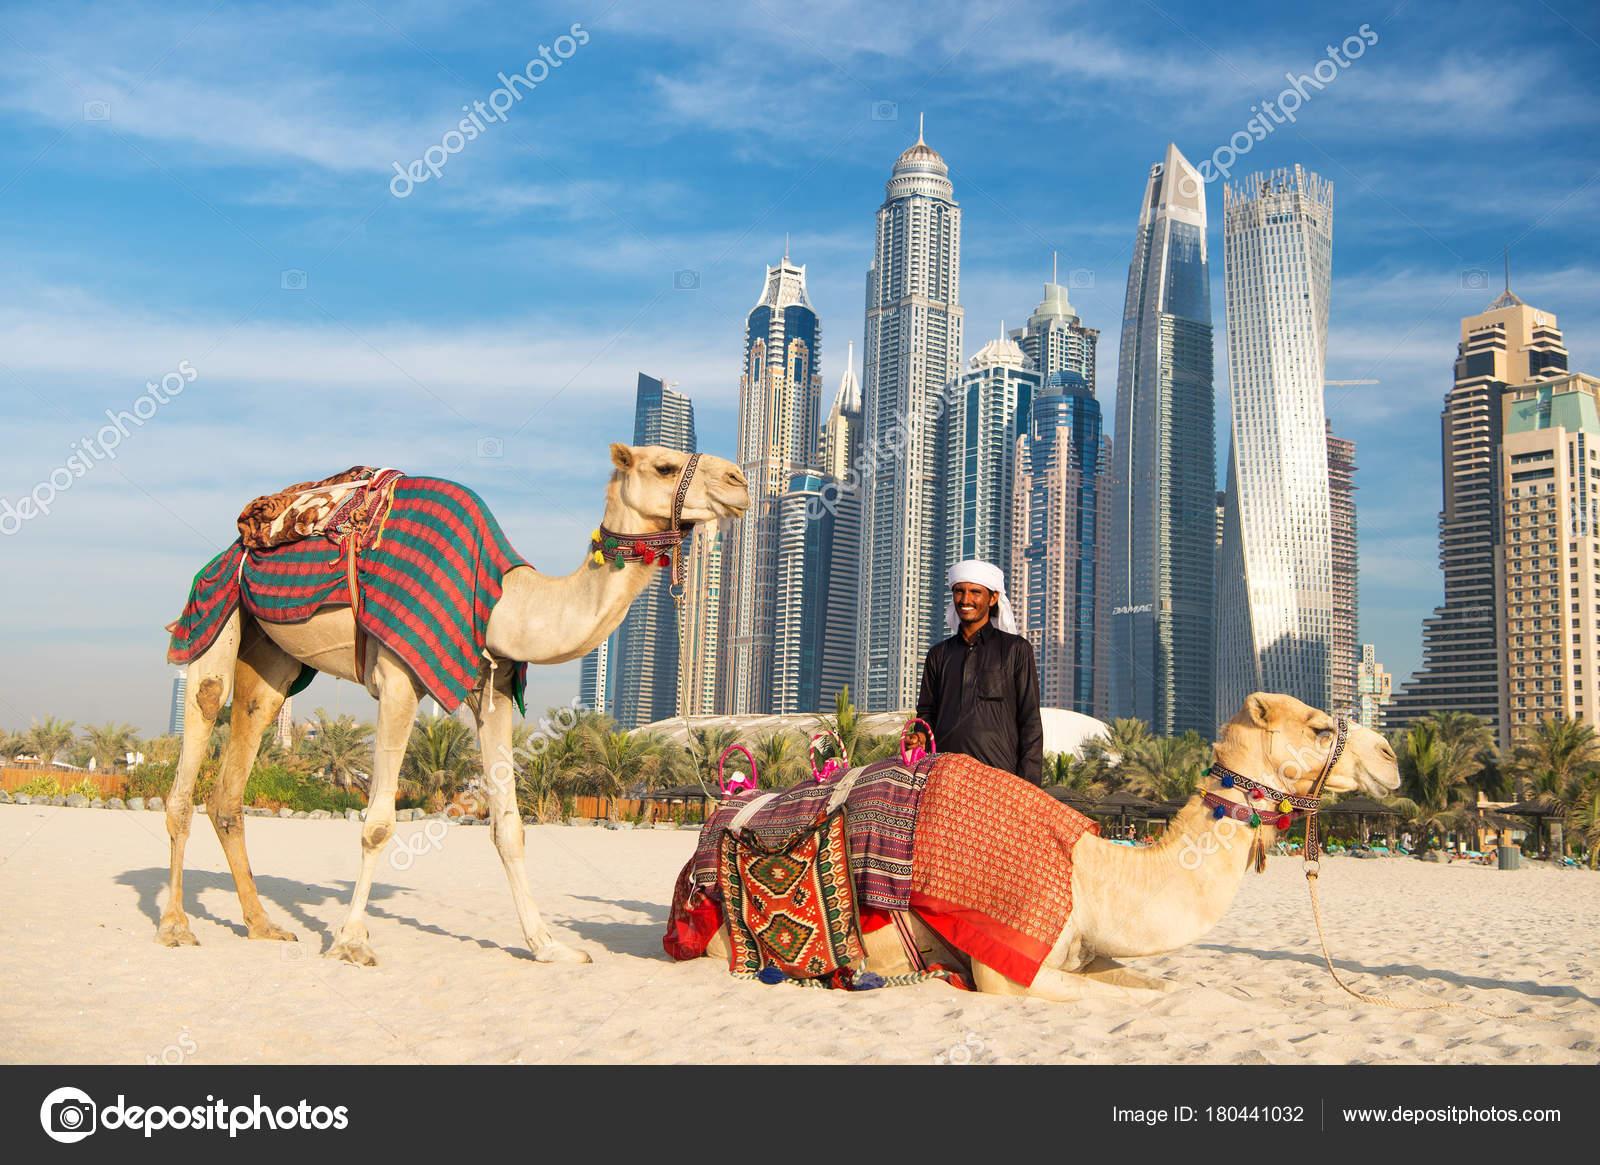 Dubai uae december 2017 camels skyscrapers background beach uae dubai uae december 2017 camels skyscrapers background beach uae dubai stock photo thecheapjerseys Choice Image